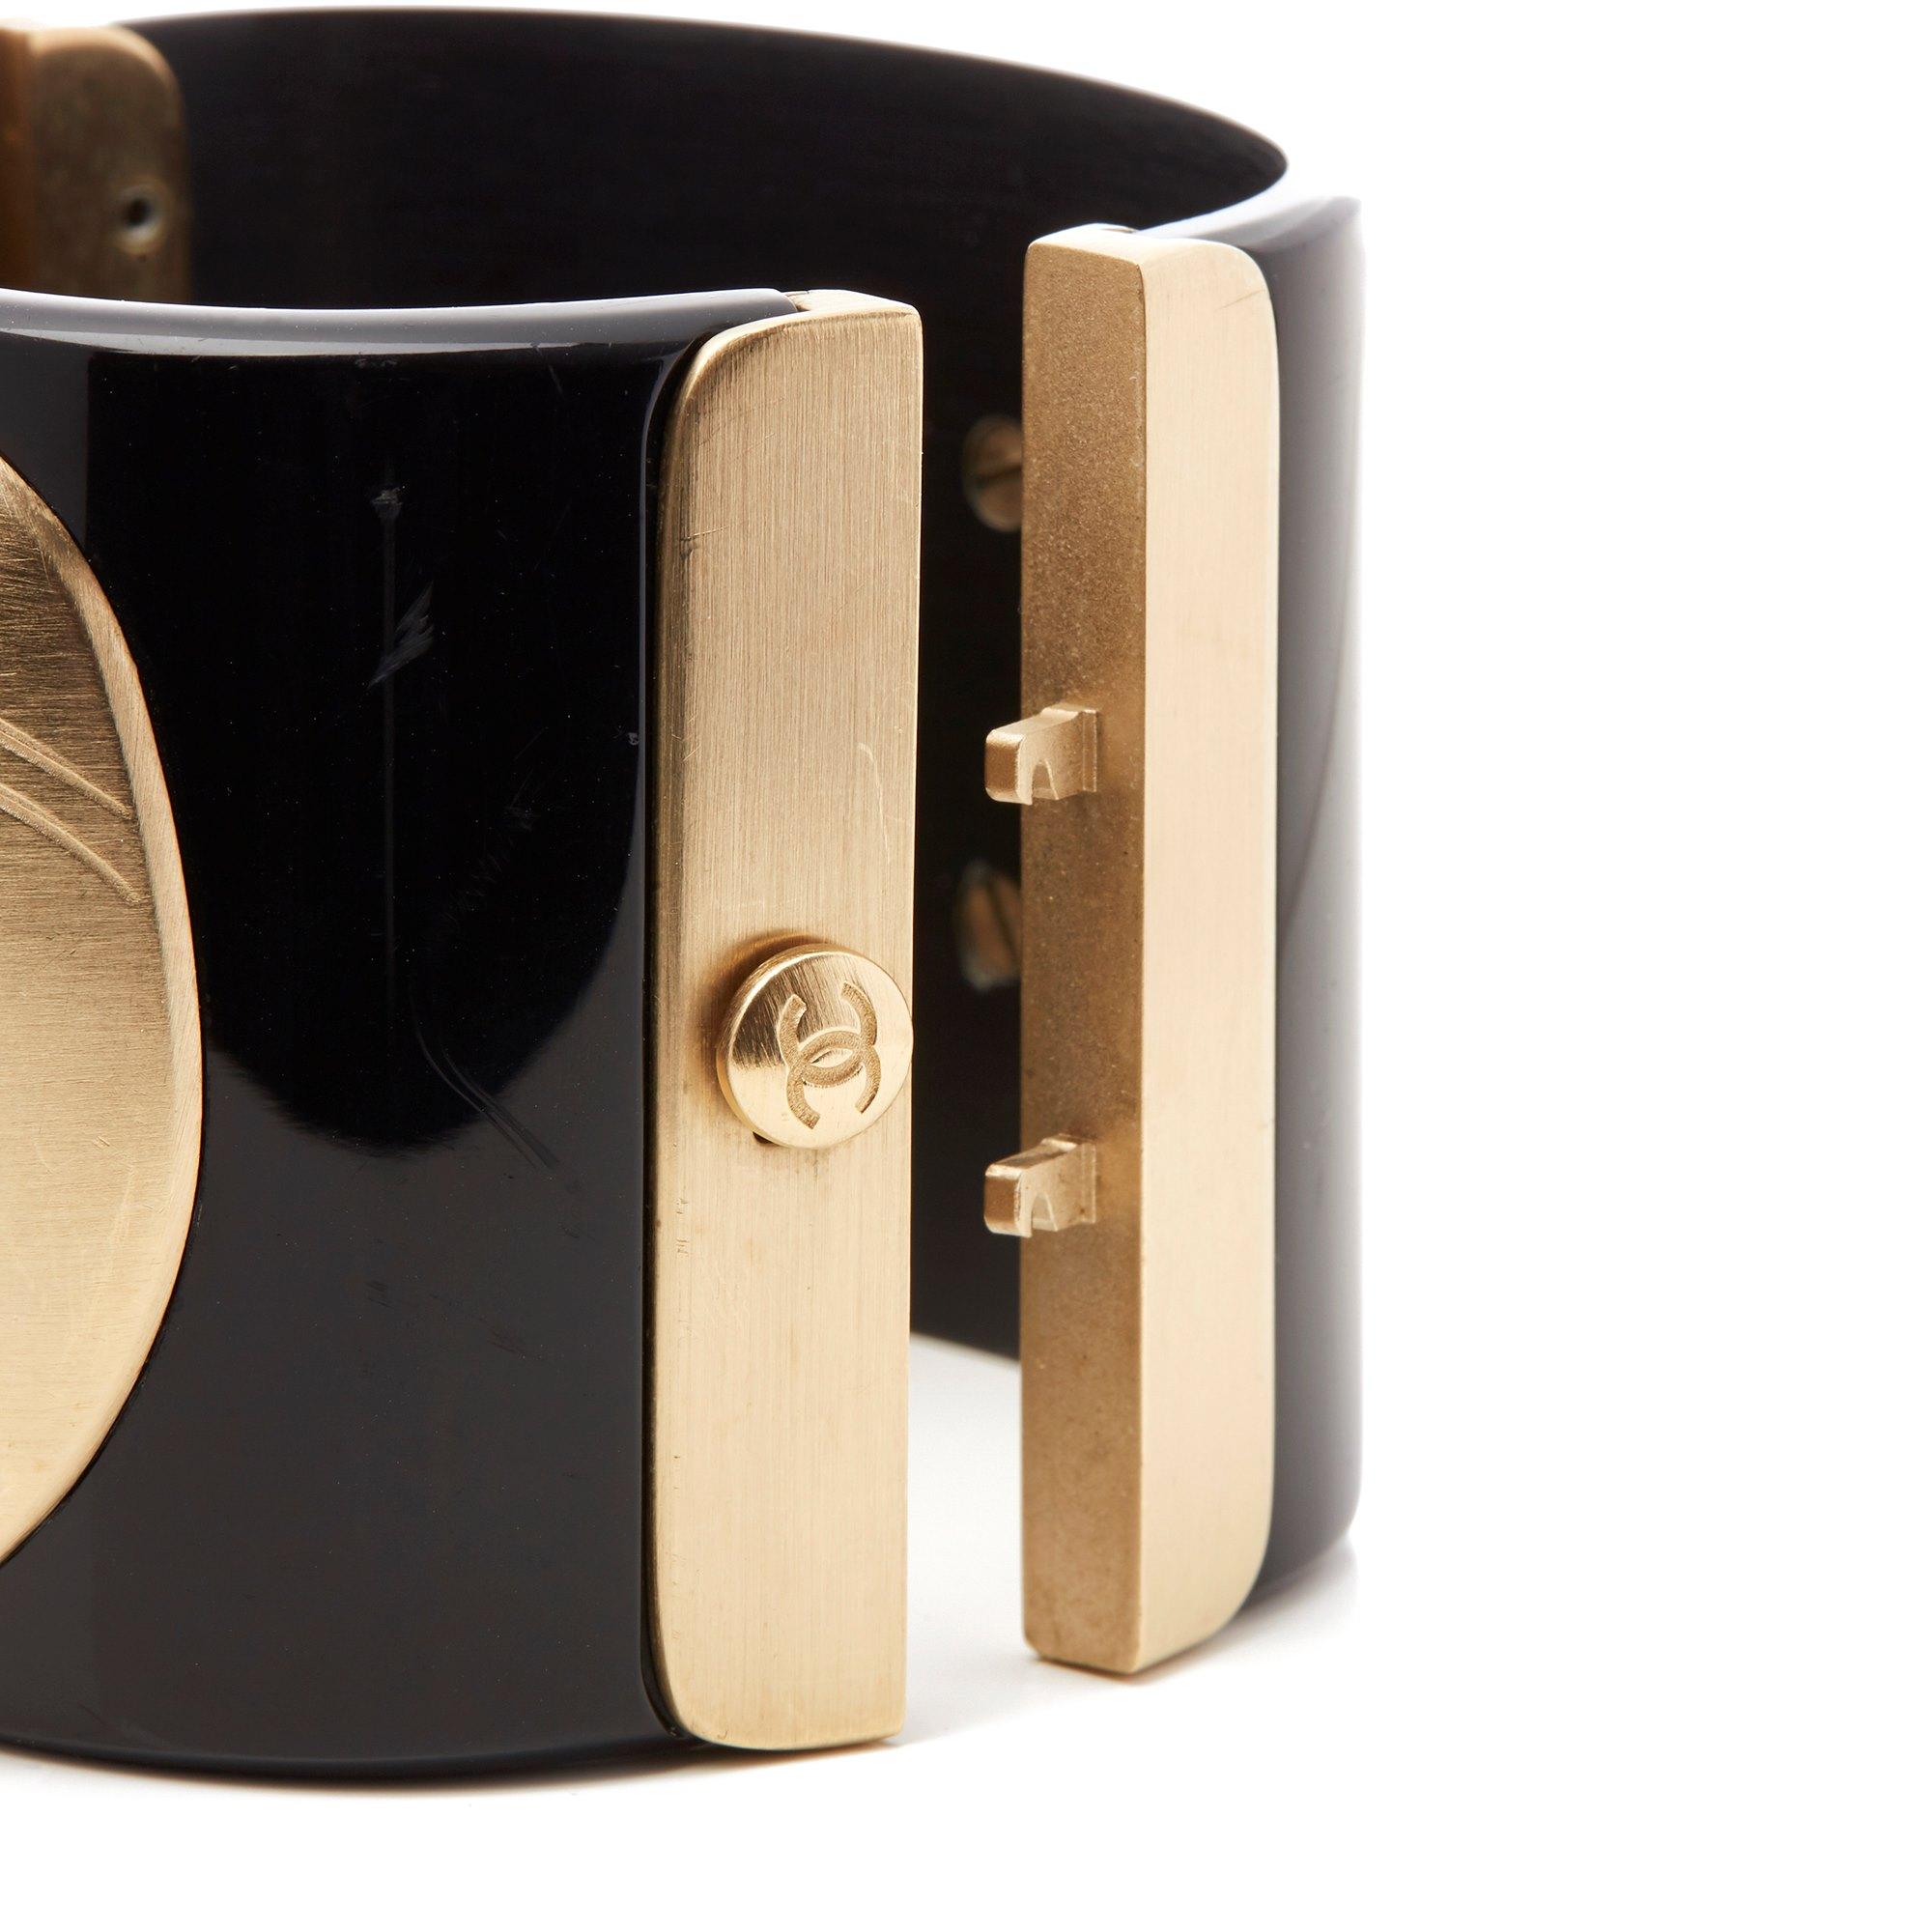 Chanel Black & Gold Tone Paris-Moscou Matryoshka Doll Cuff Bracelet